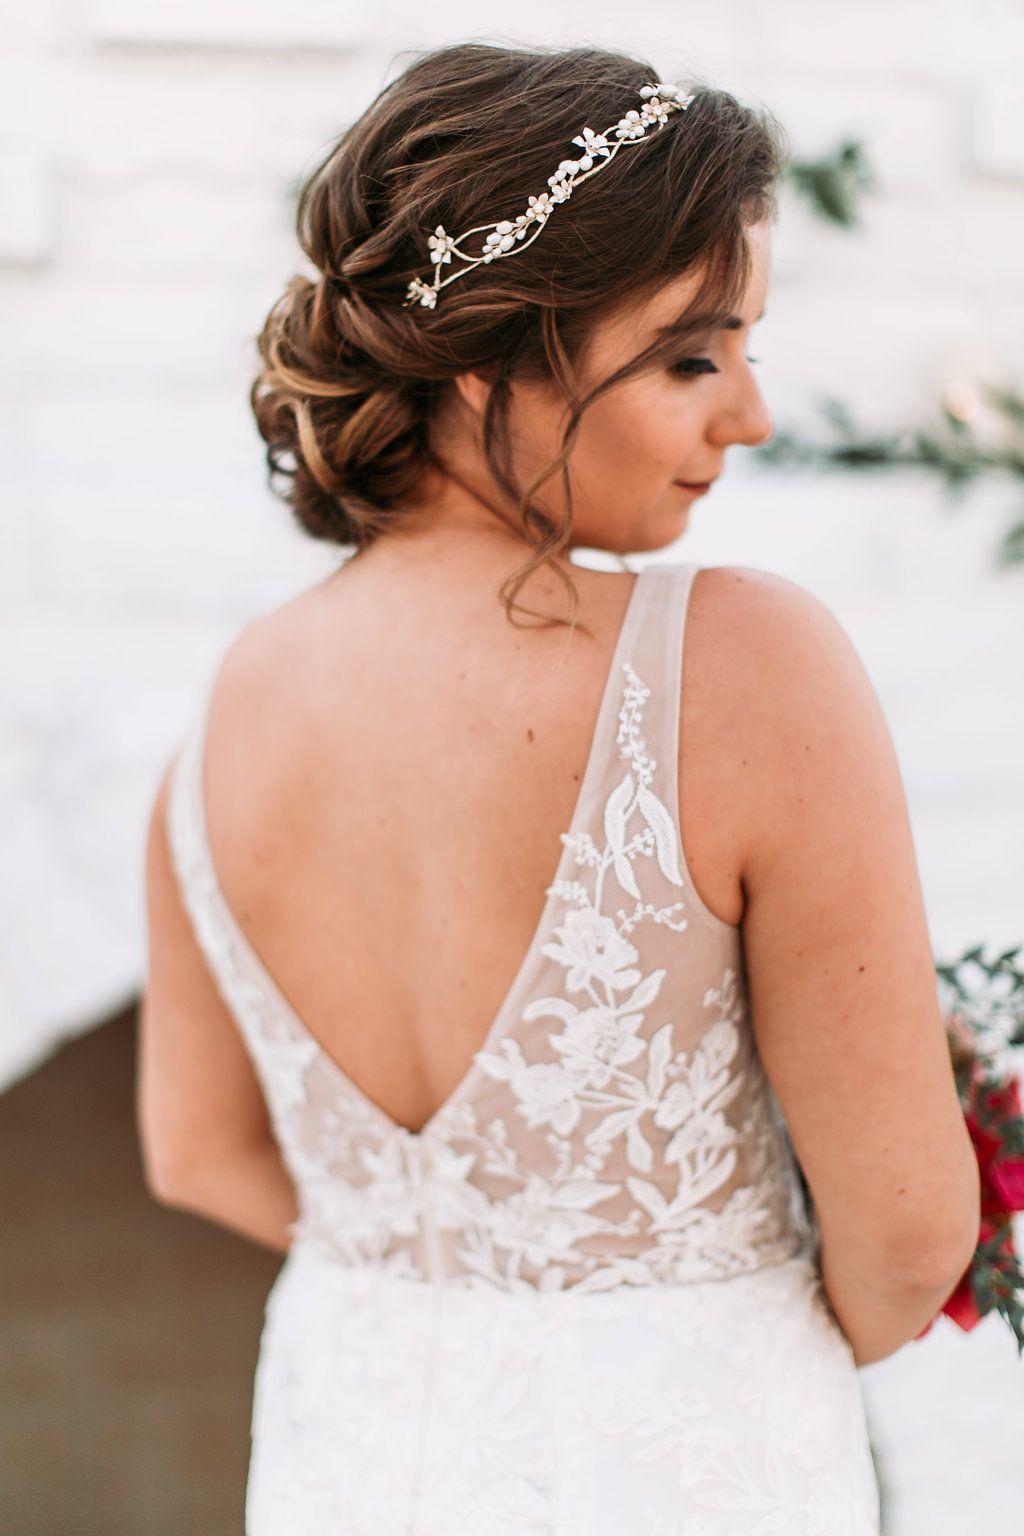 Tercero By Aldea Weddings Glendale Arizona Wedding Venue Inspiration The